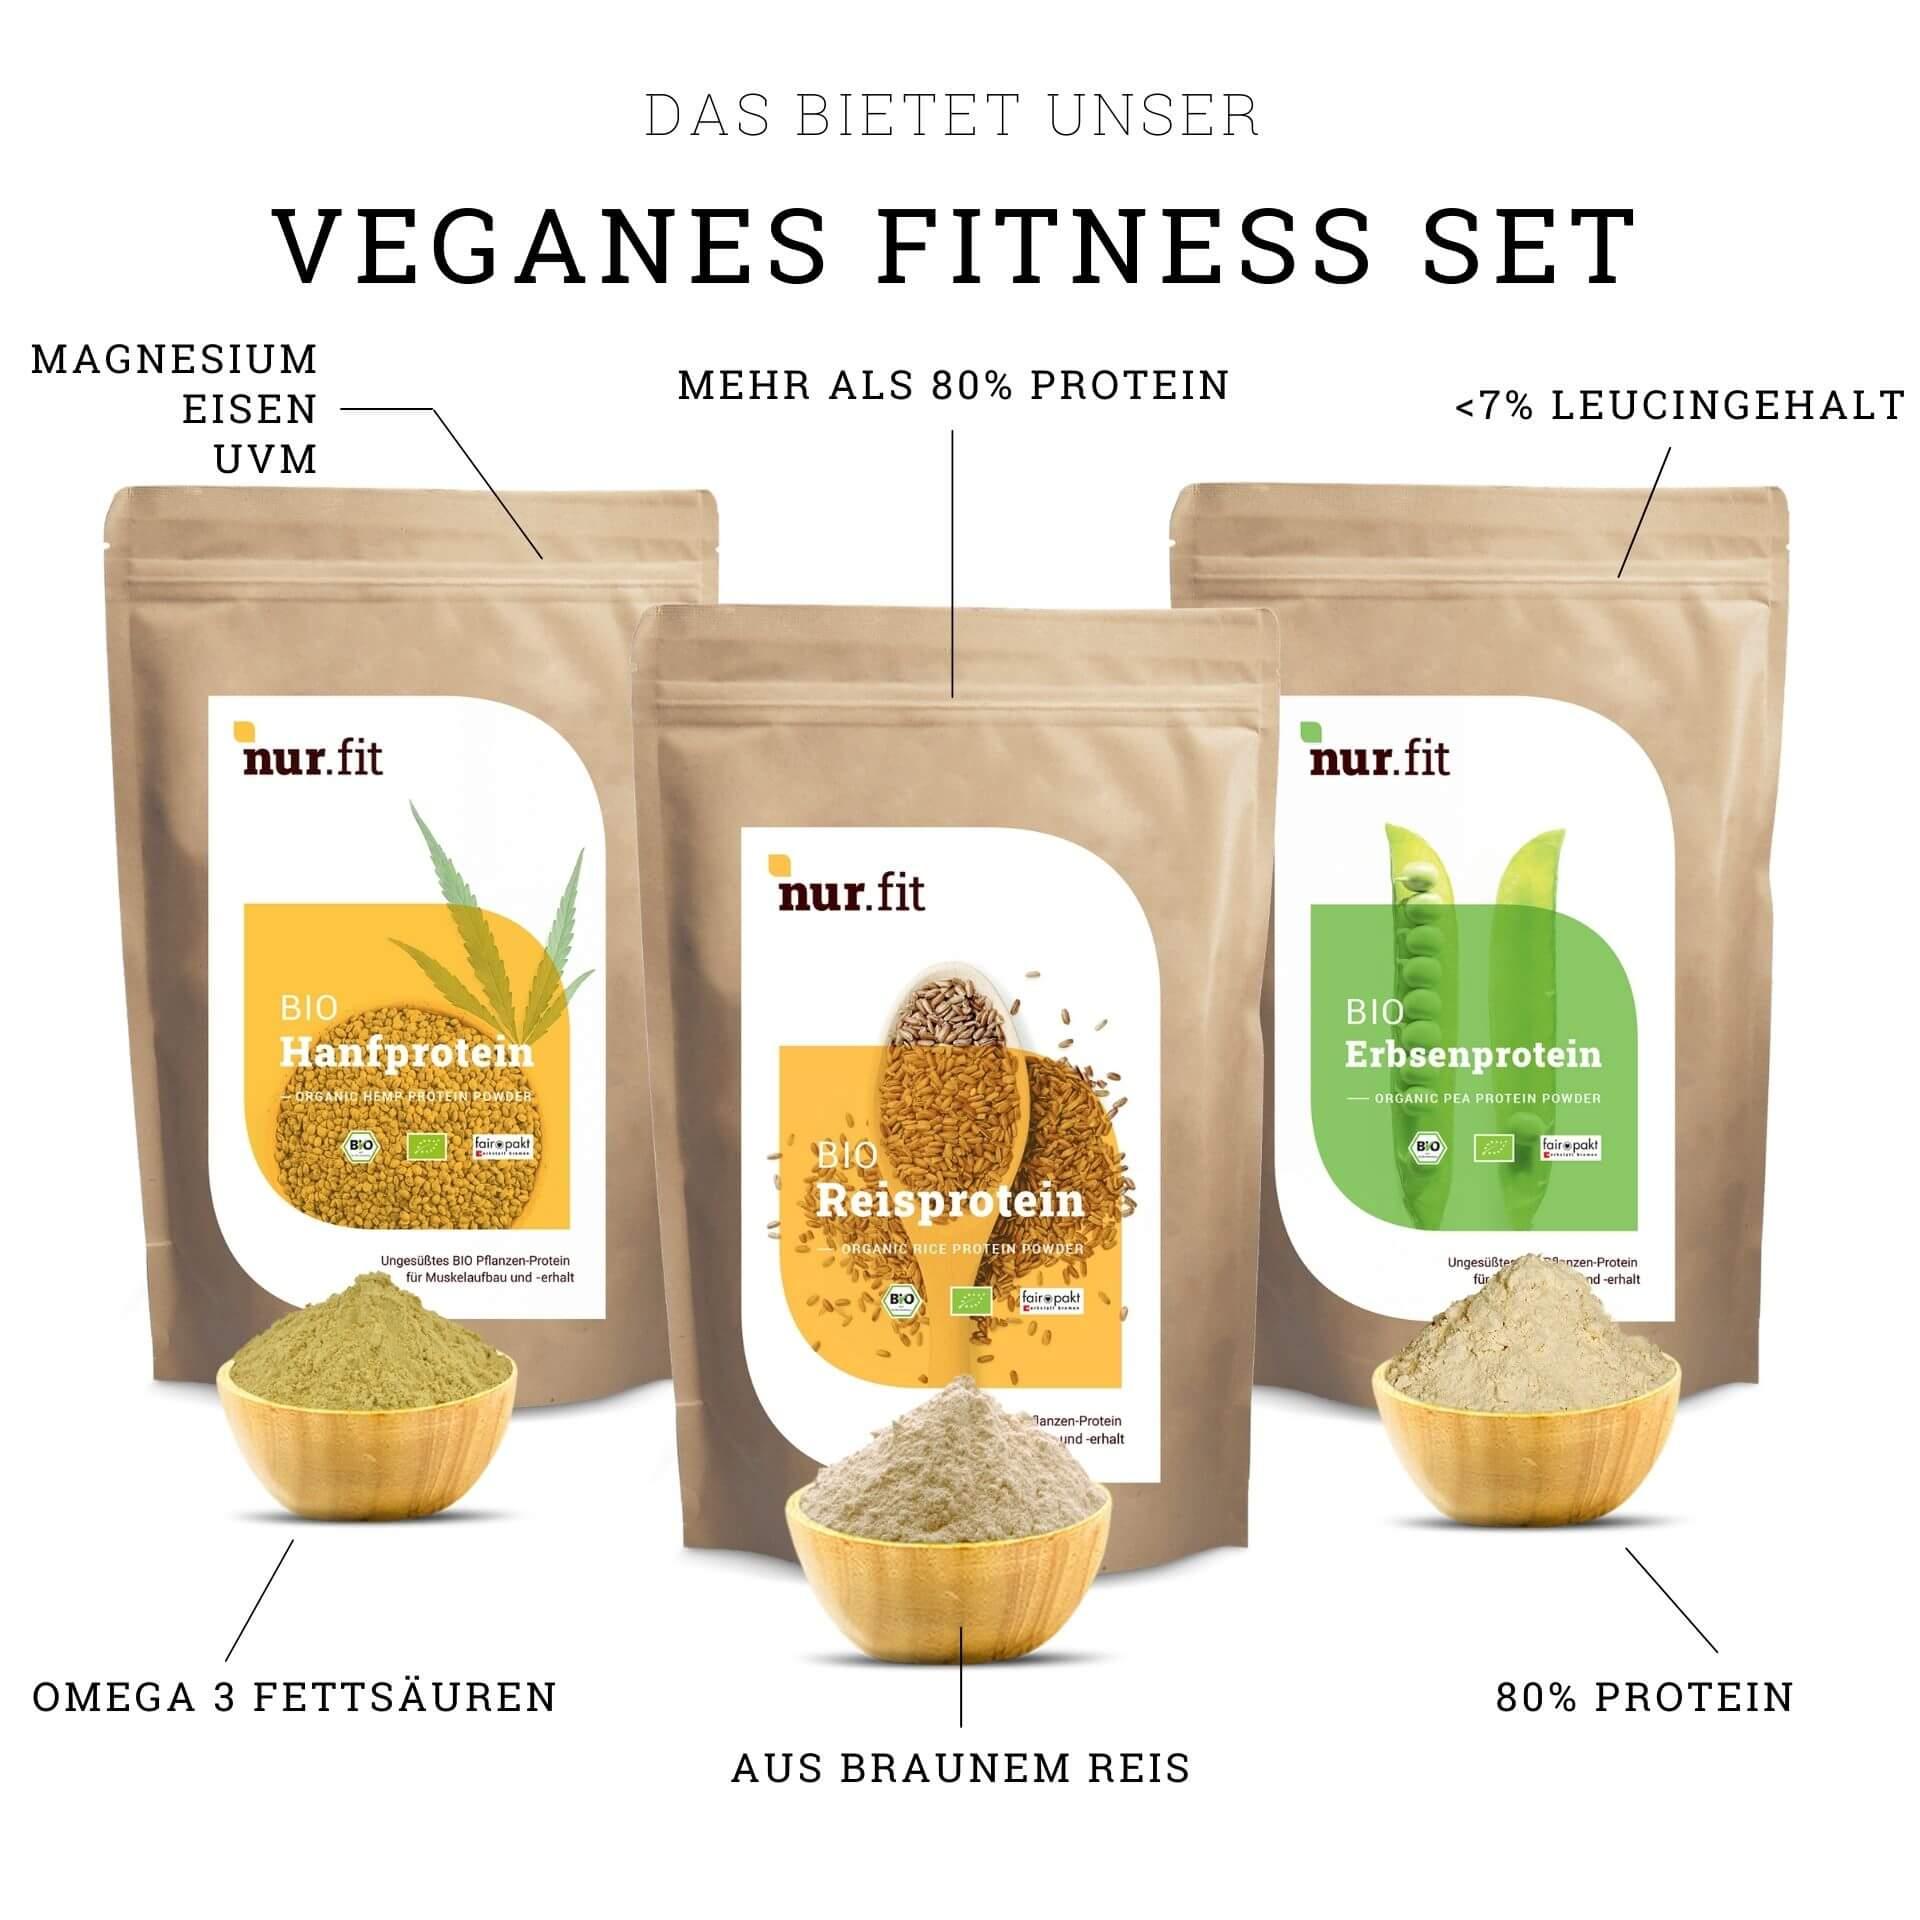 Veganes Fitness Set